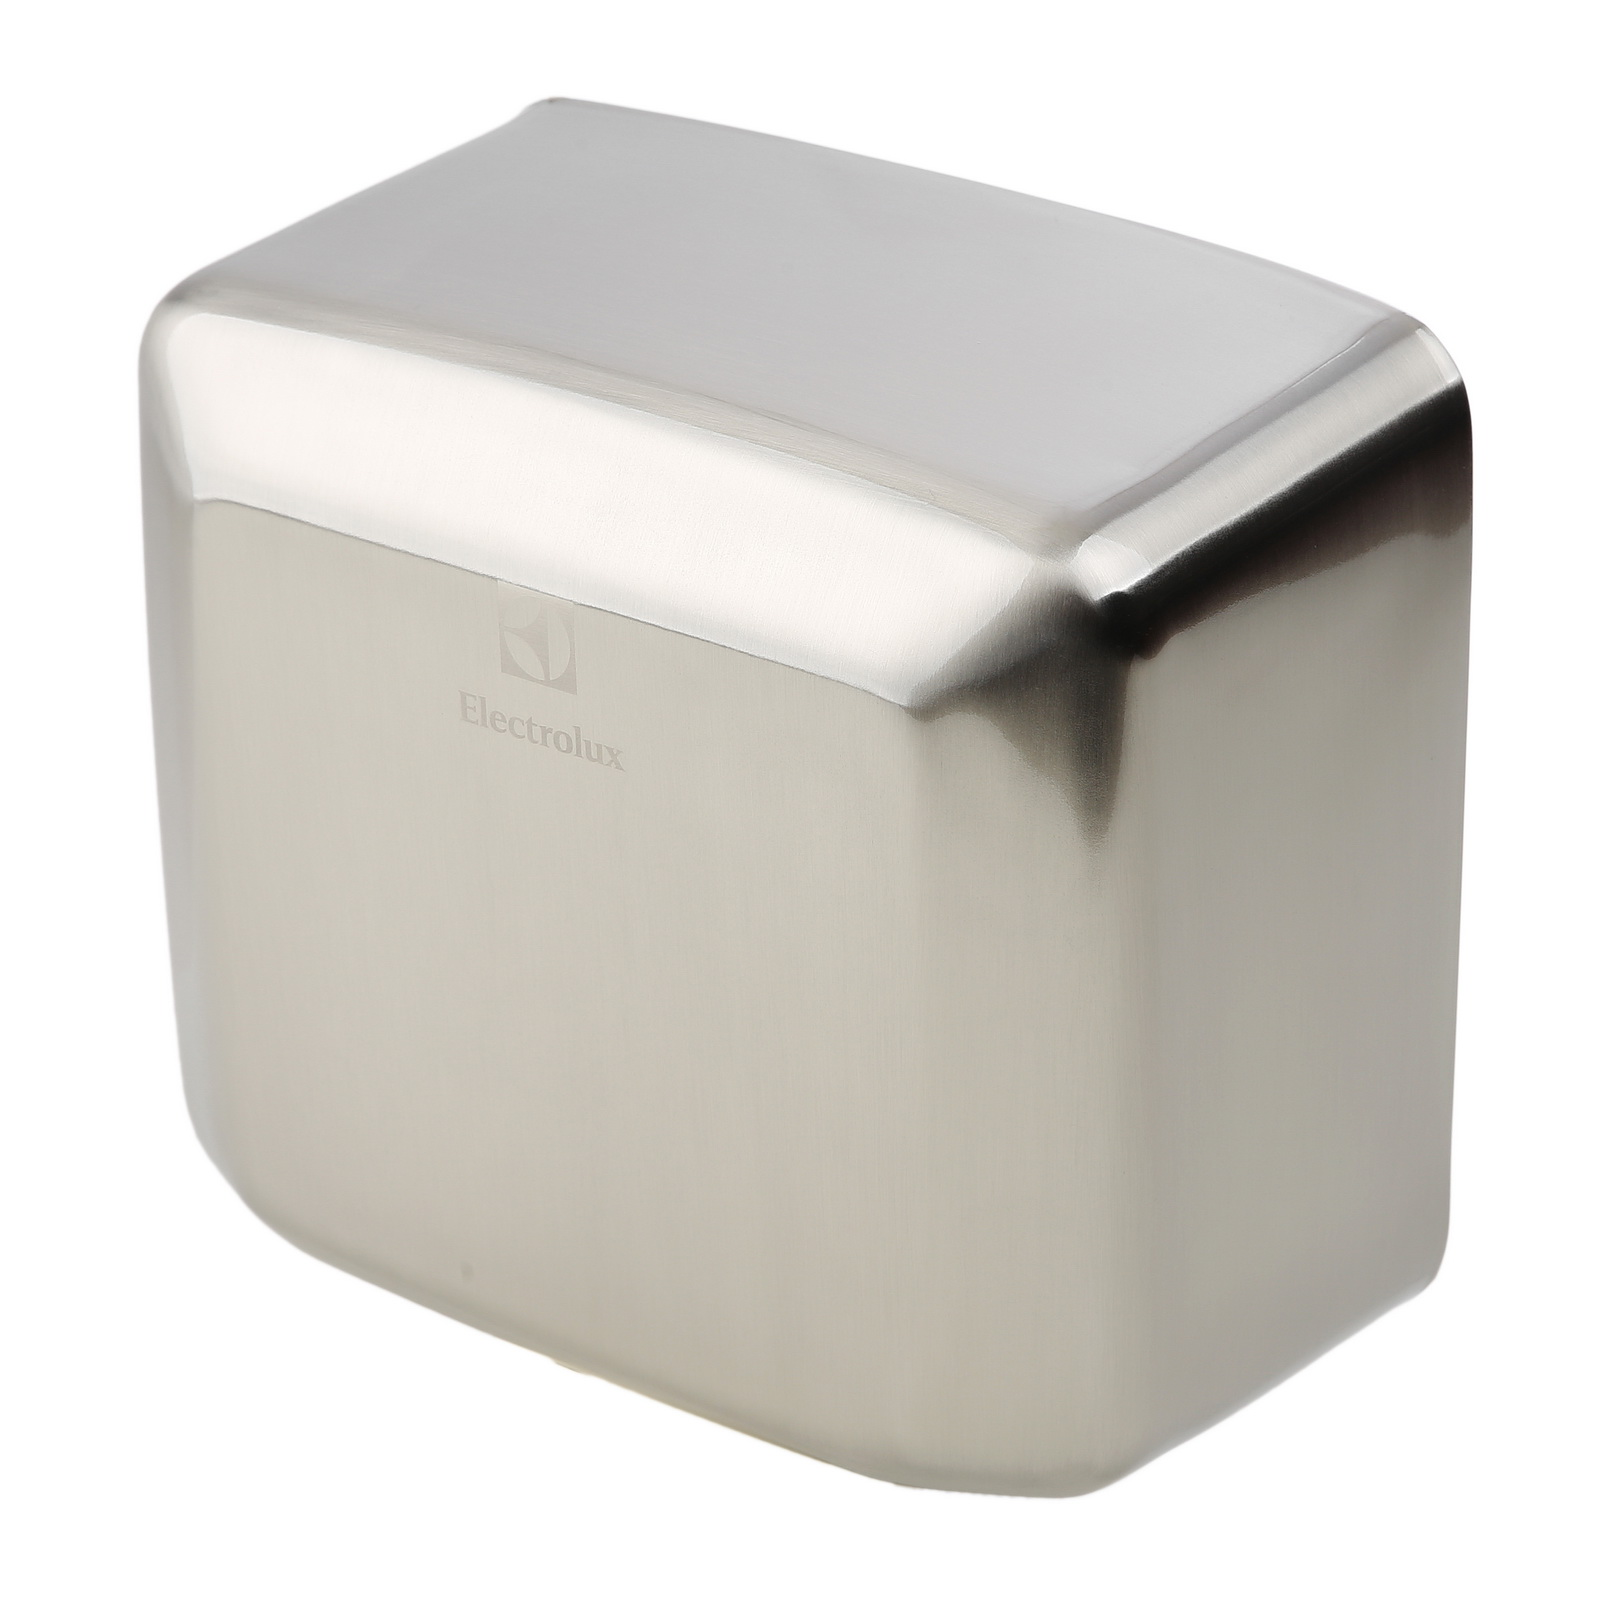 Сушилка для рук Electrolux Ehda–2500